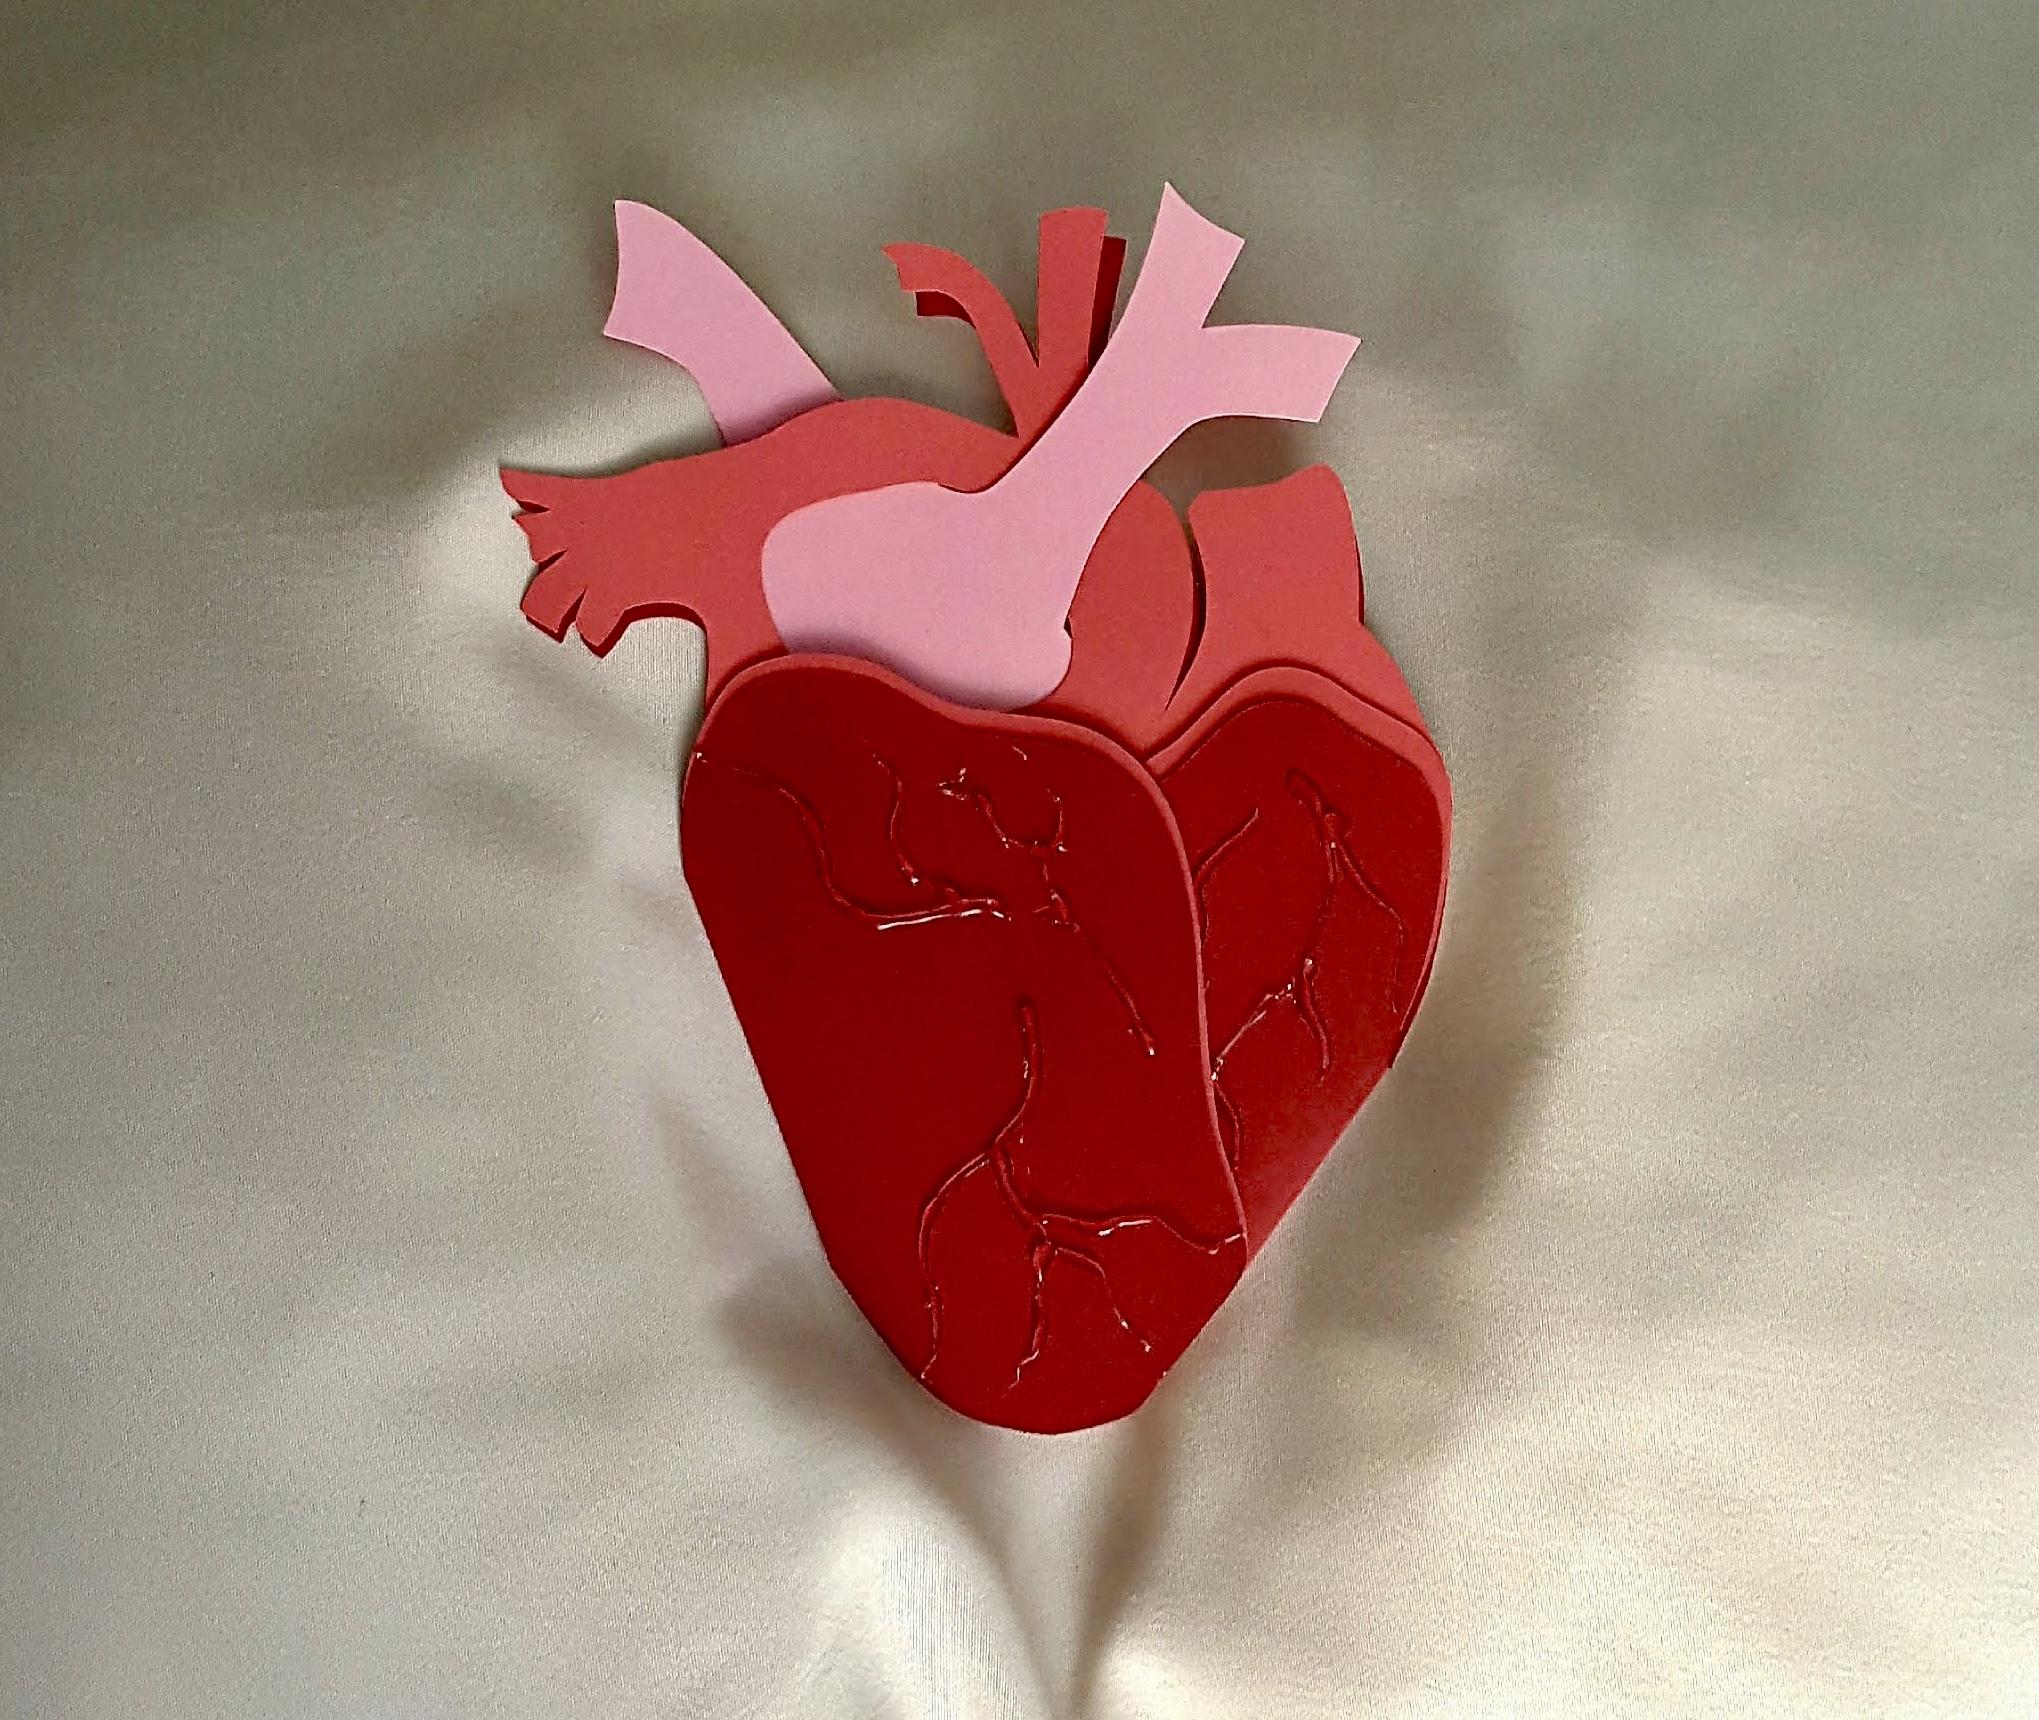 Anatomical Heart Goth Greeting Card 166856